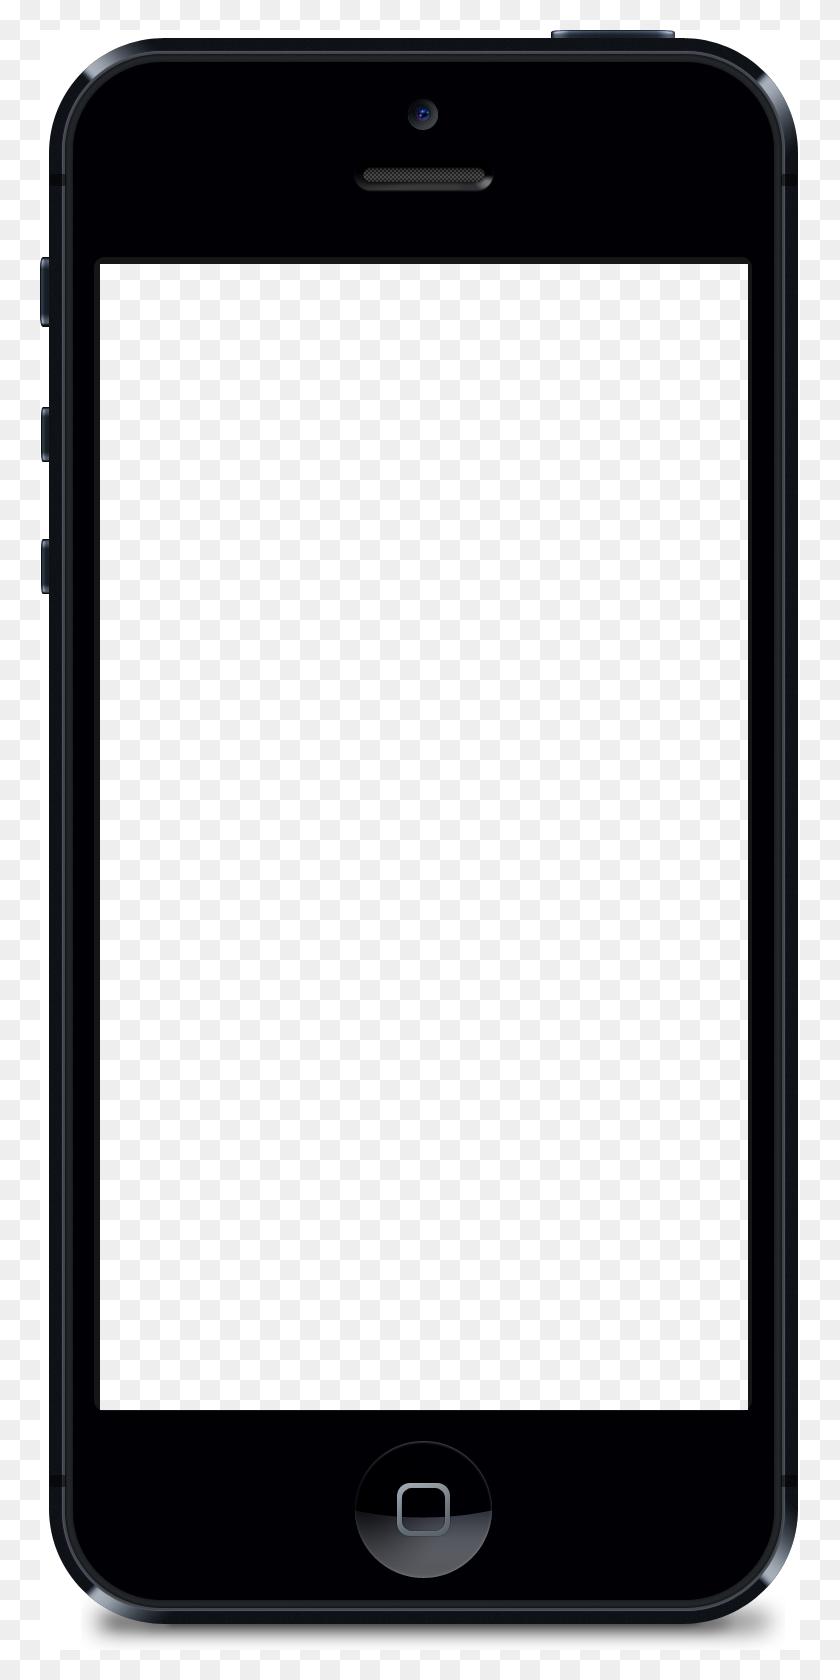 Iphone Mock Ups Templates, Mockup And Mockup Templates - Iphone Mockup PNG